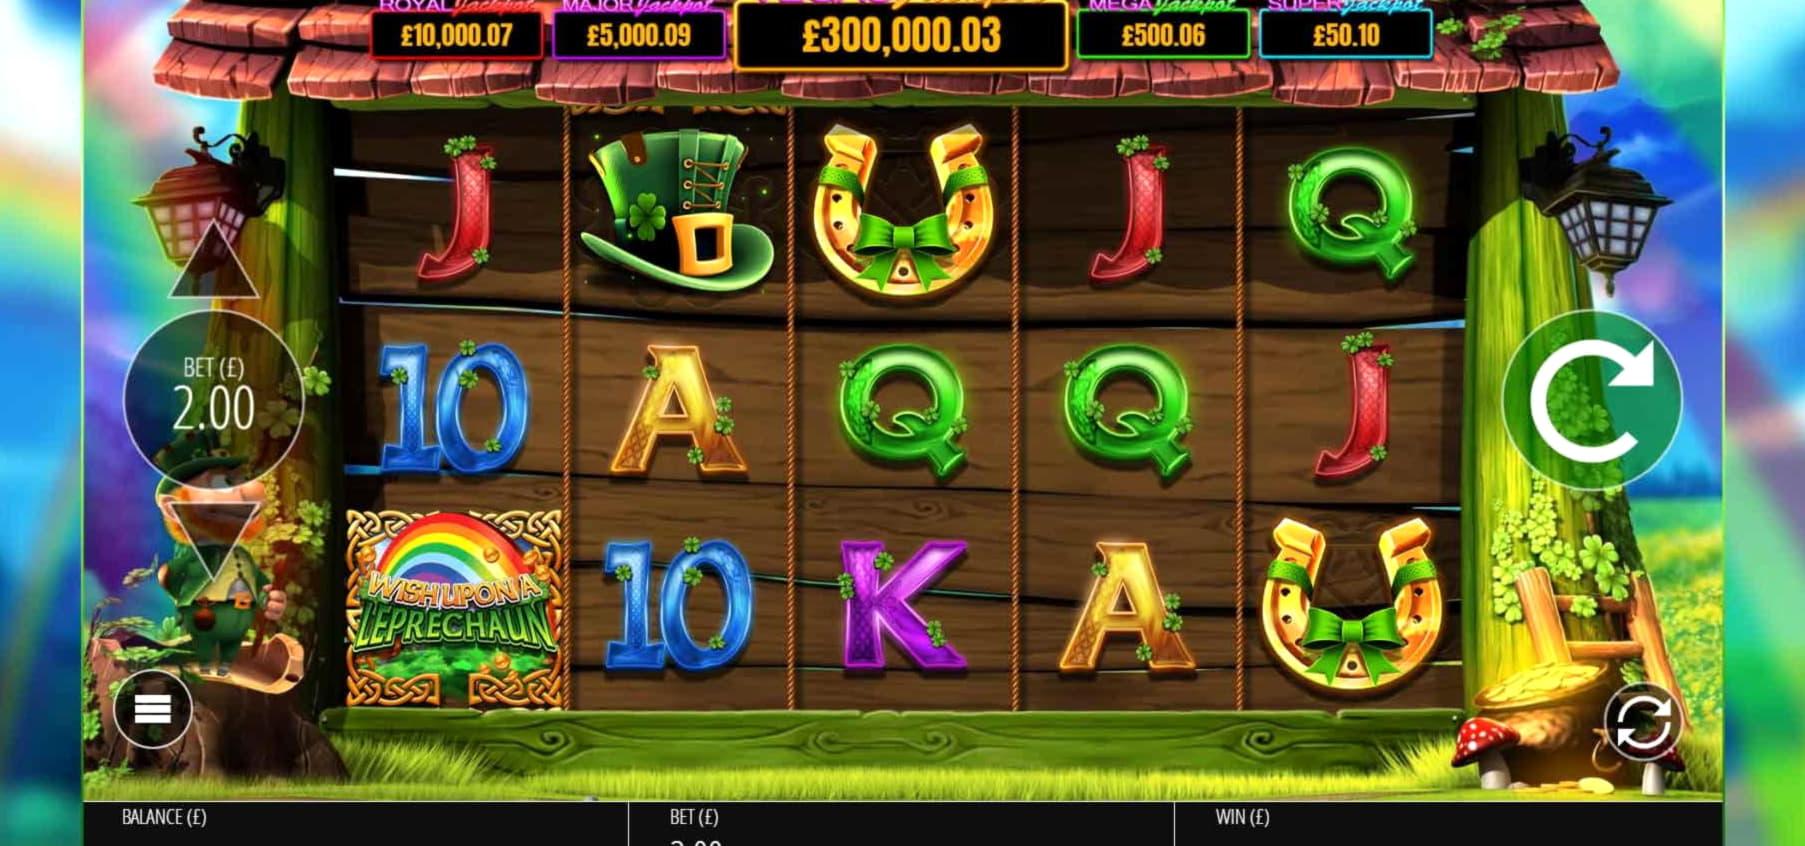 300% Signup Casino Bonus at Dafa Bet Casino